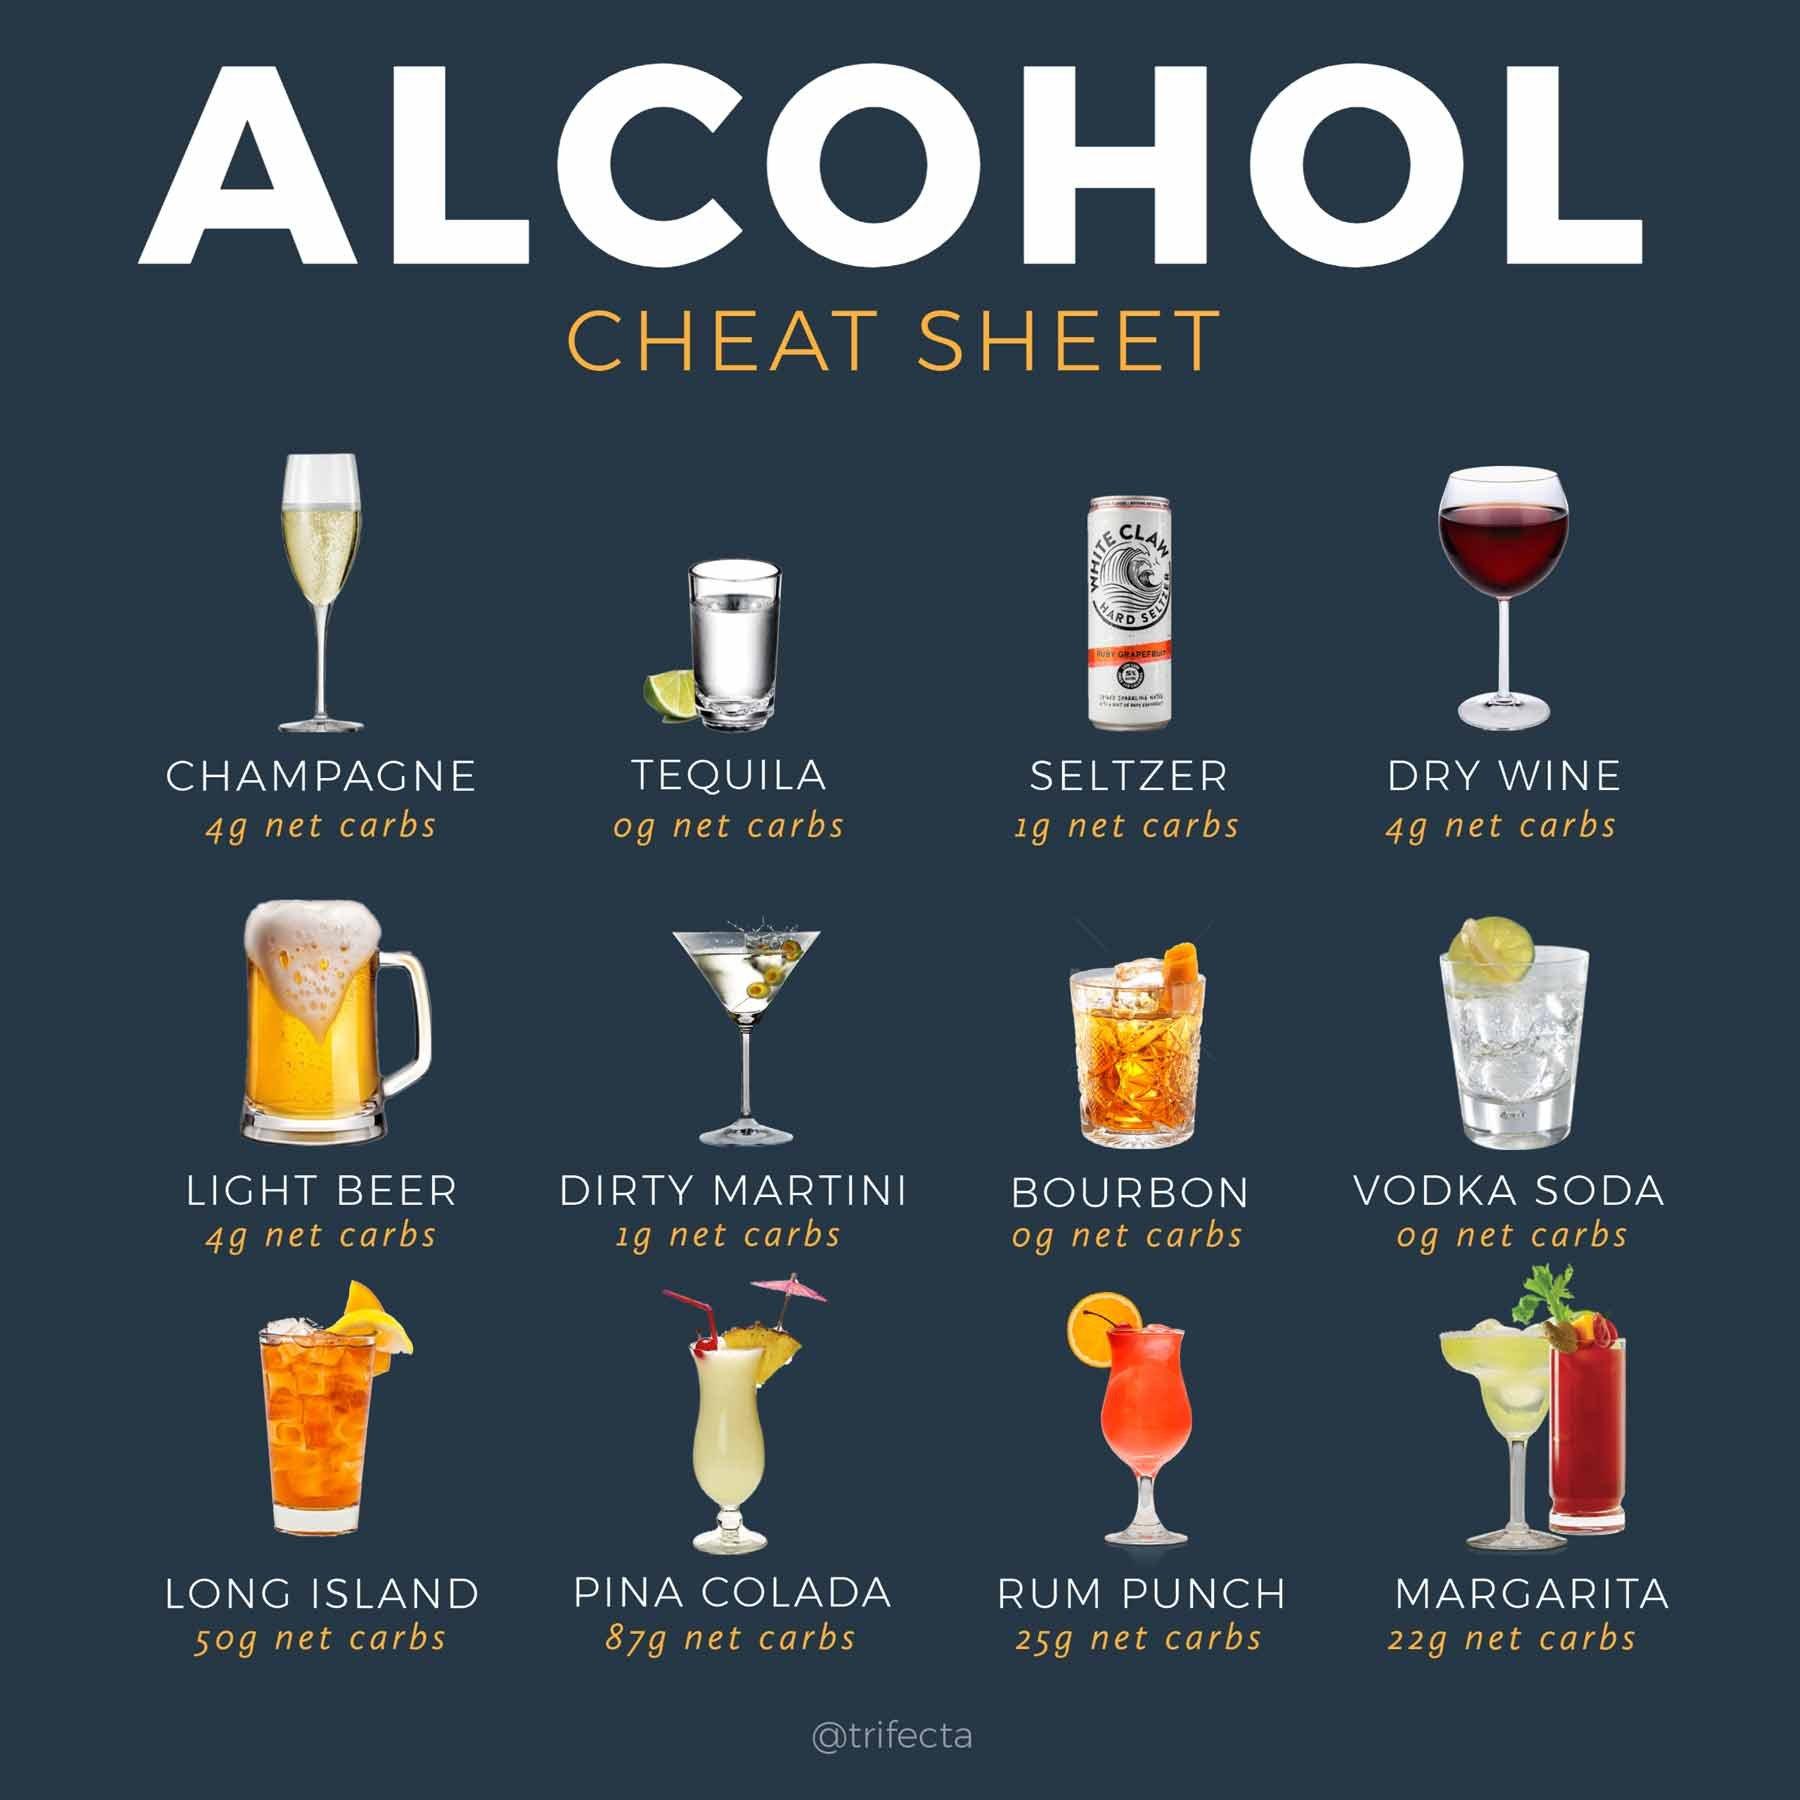 KETO Alcohol DRINK CHEAT SHEET